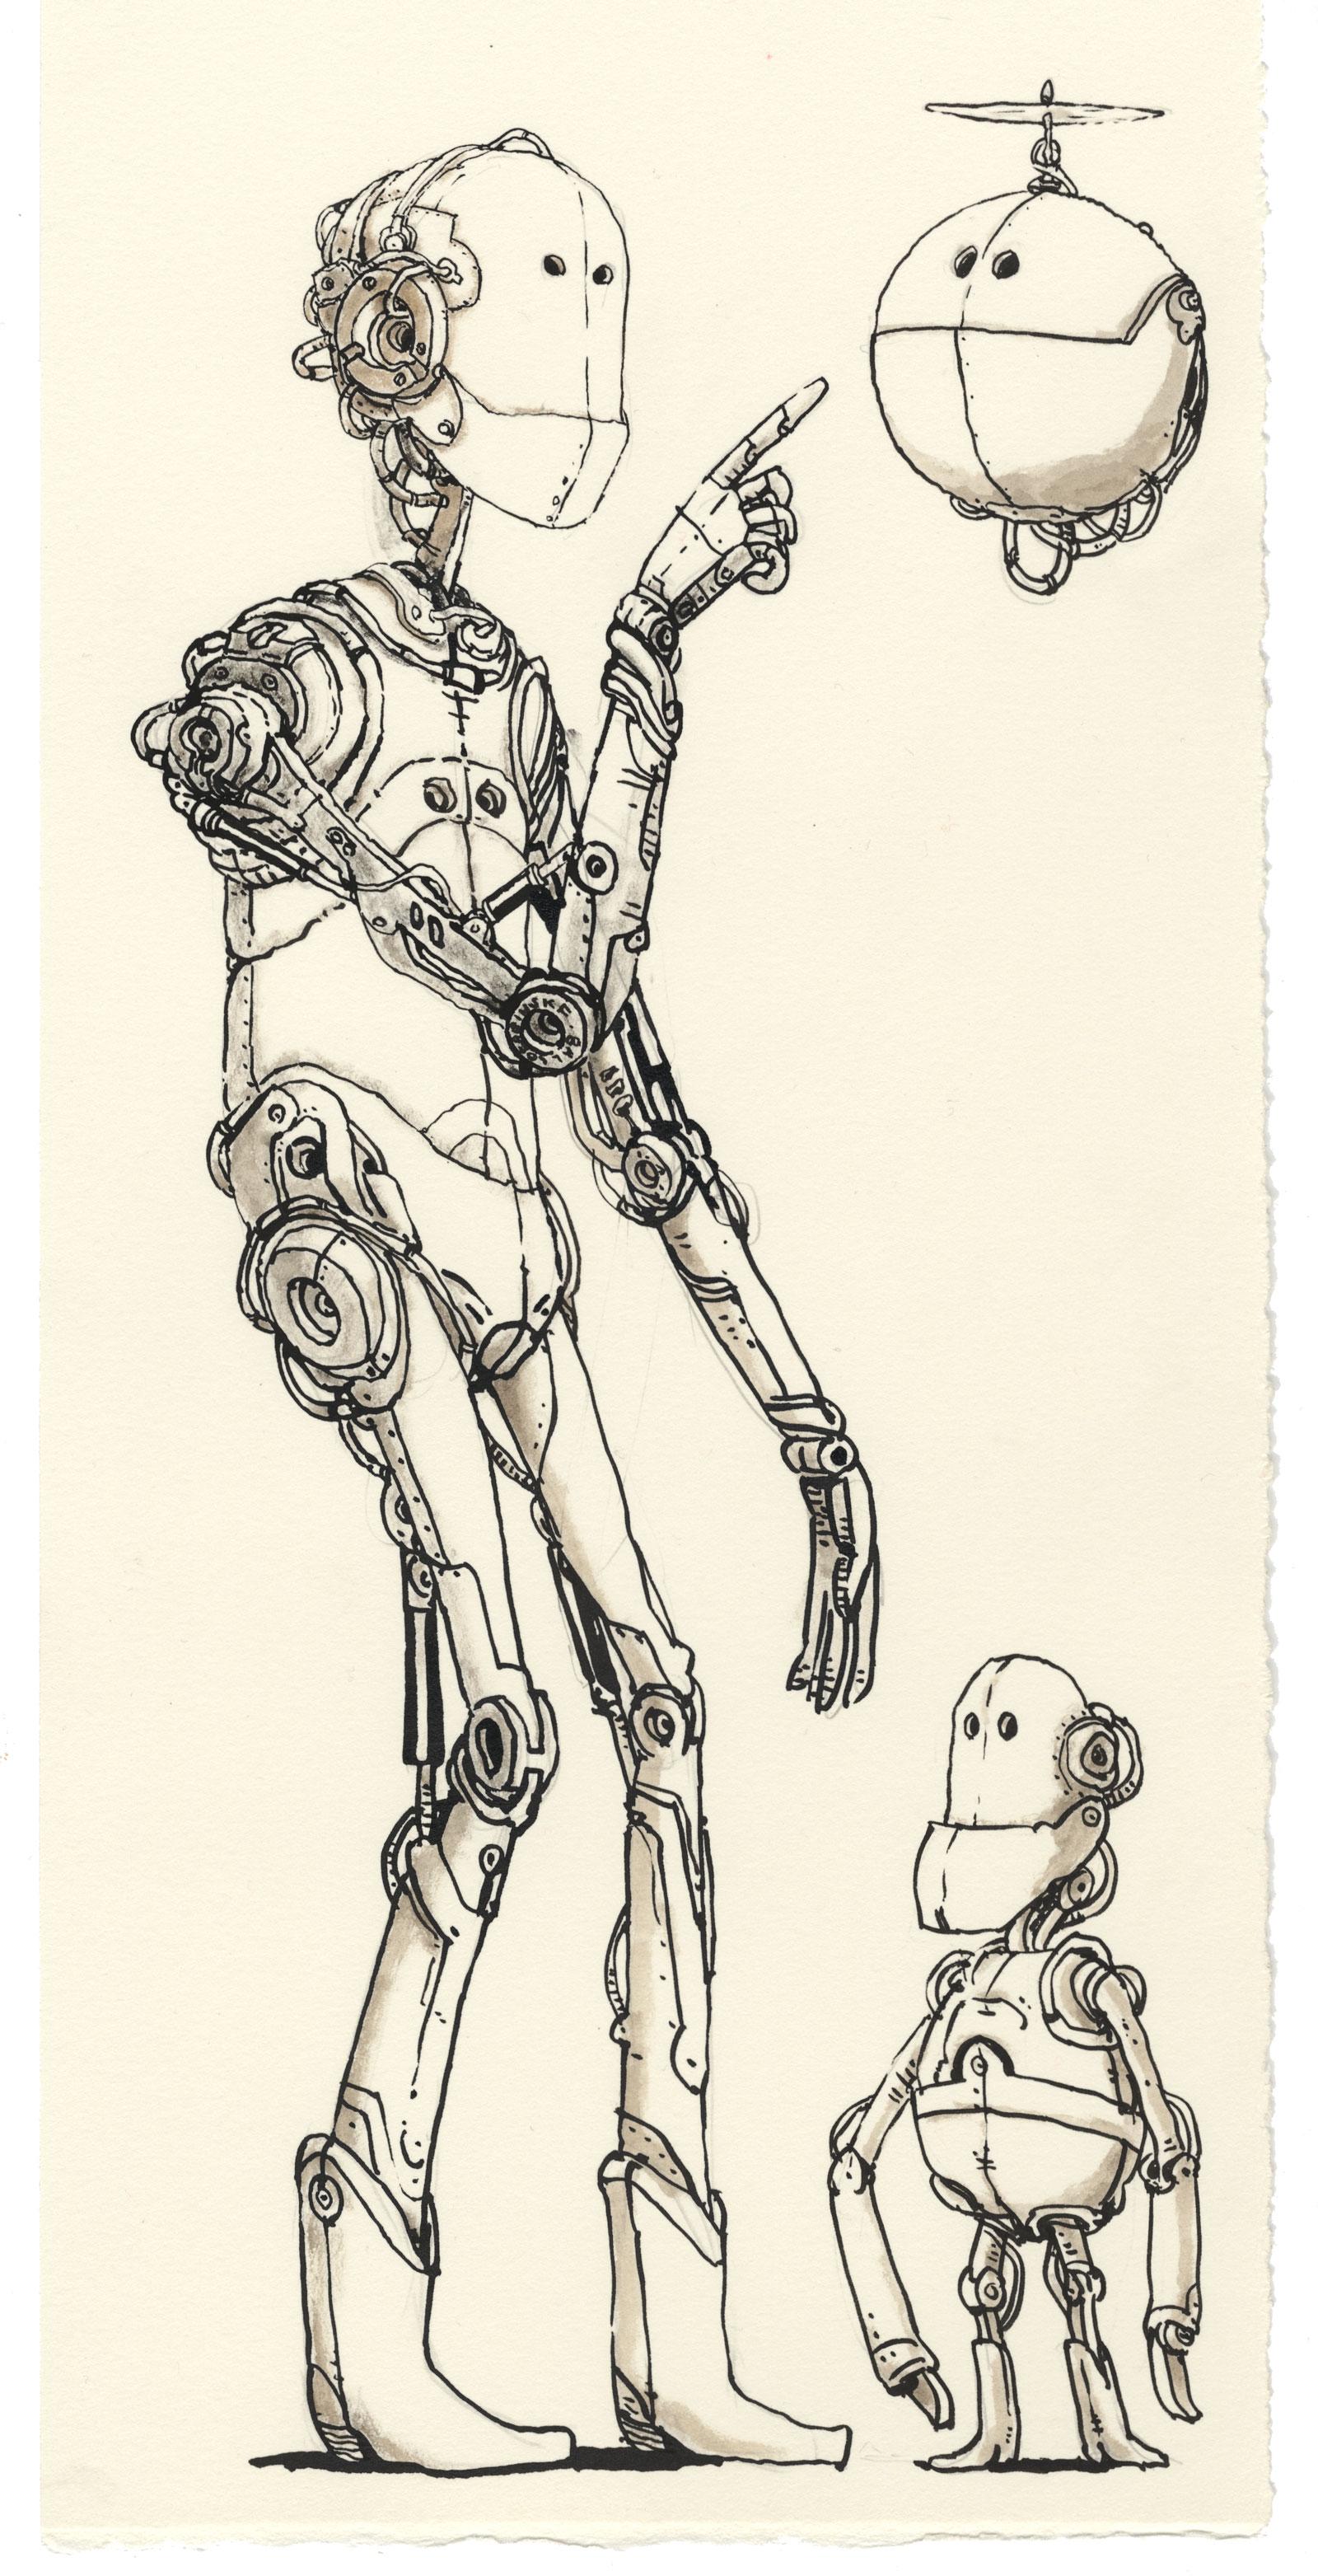 Unruly robot by MattiasA